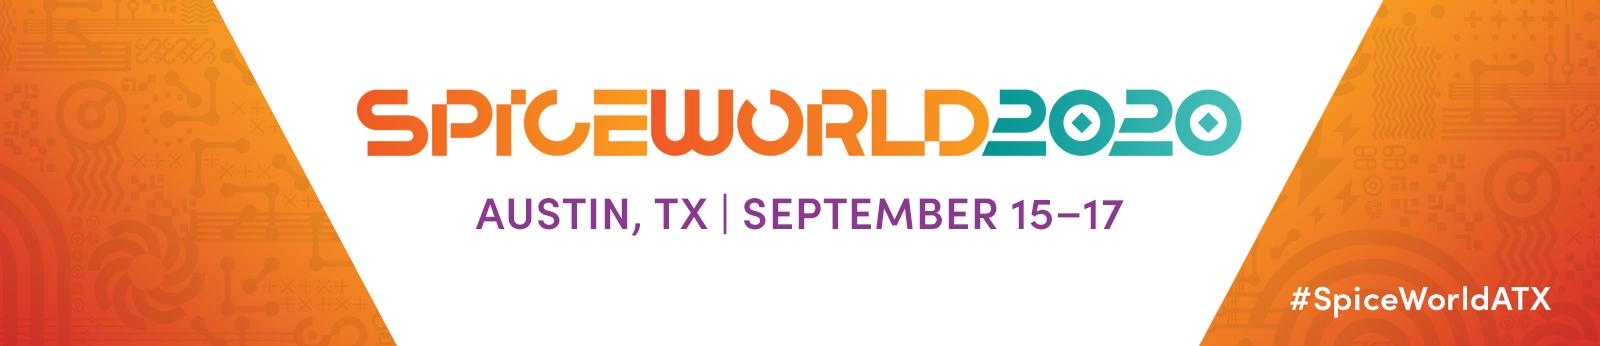 SpiceWorld Austin 2020